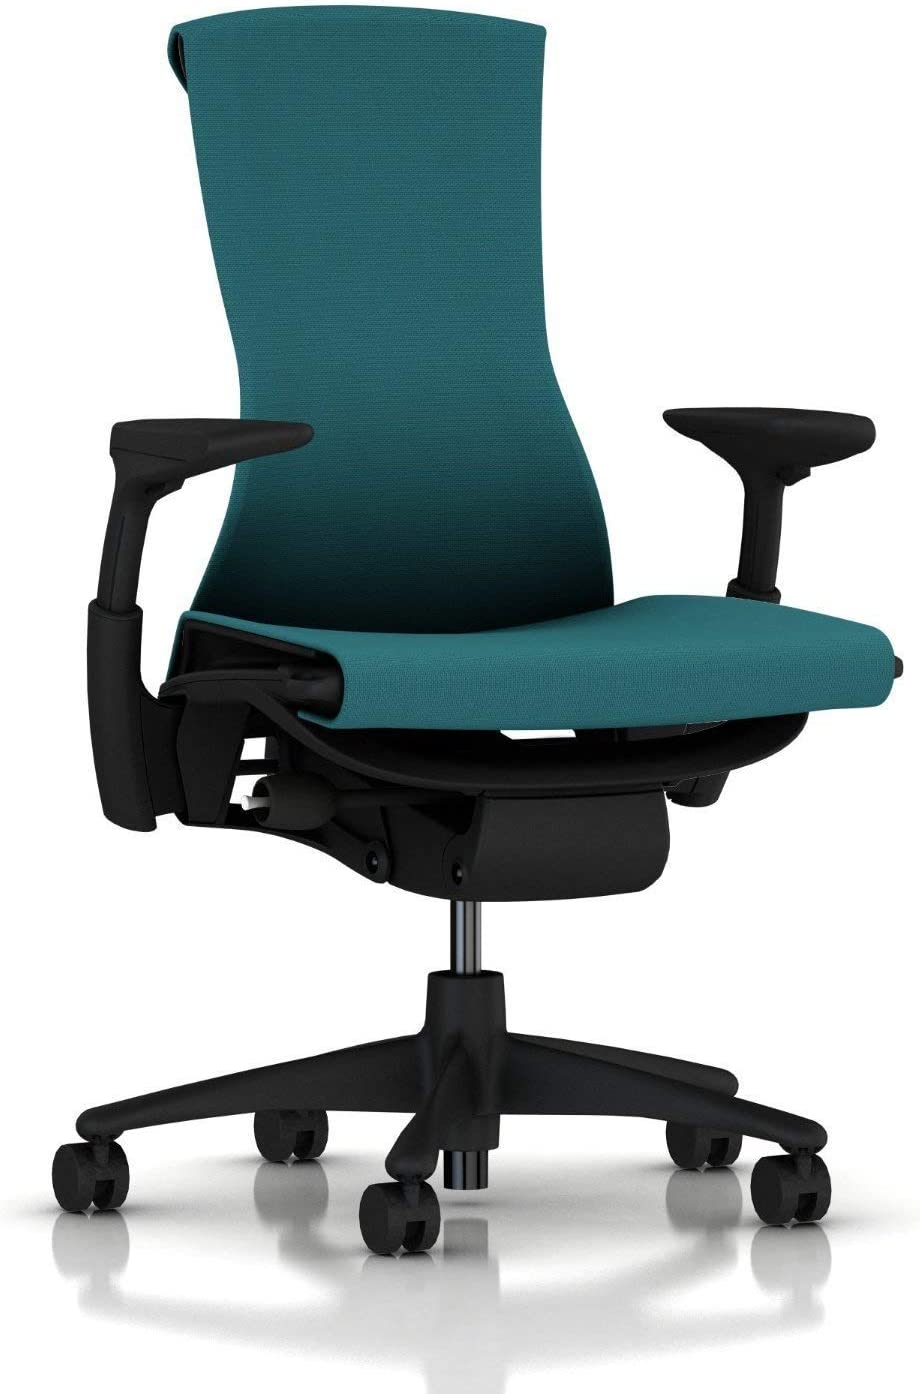 Mejor silla de oficina Herman Miller